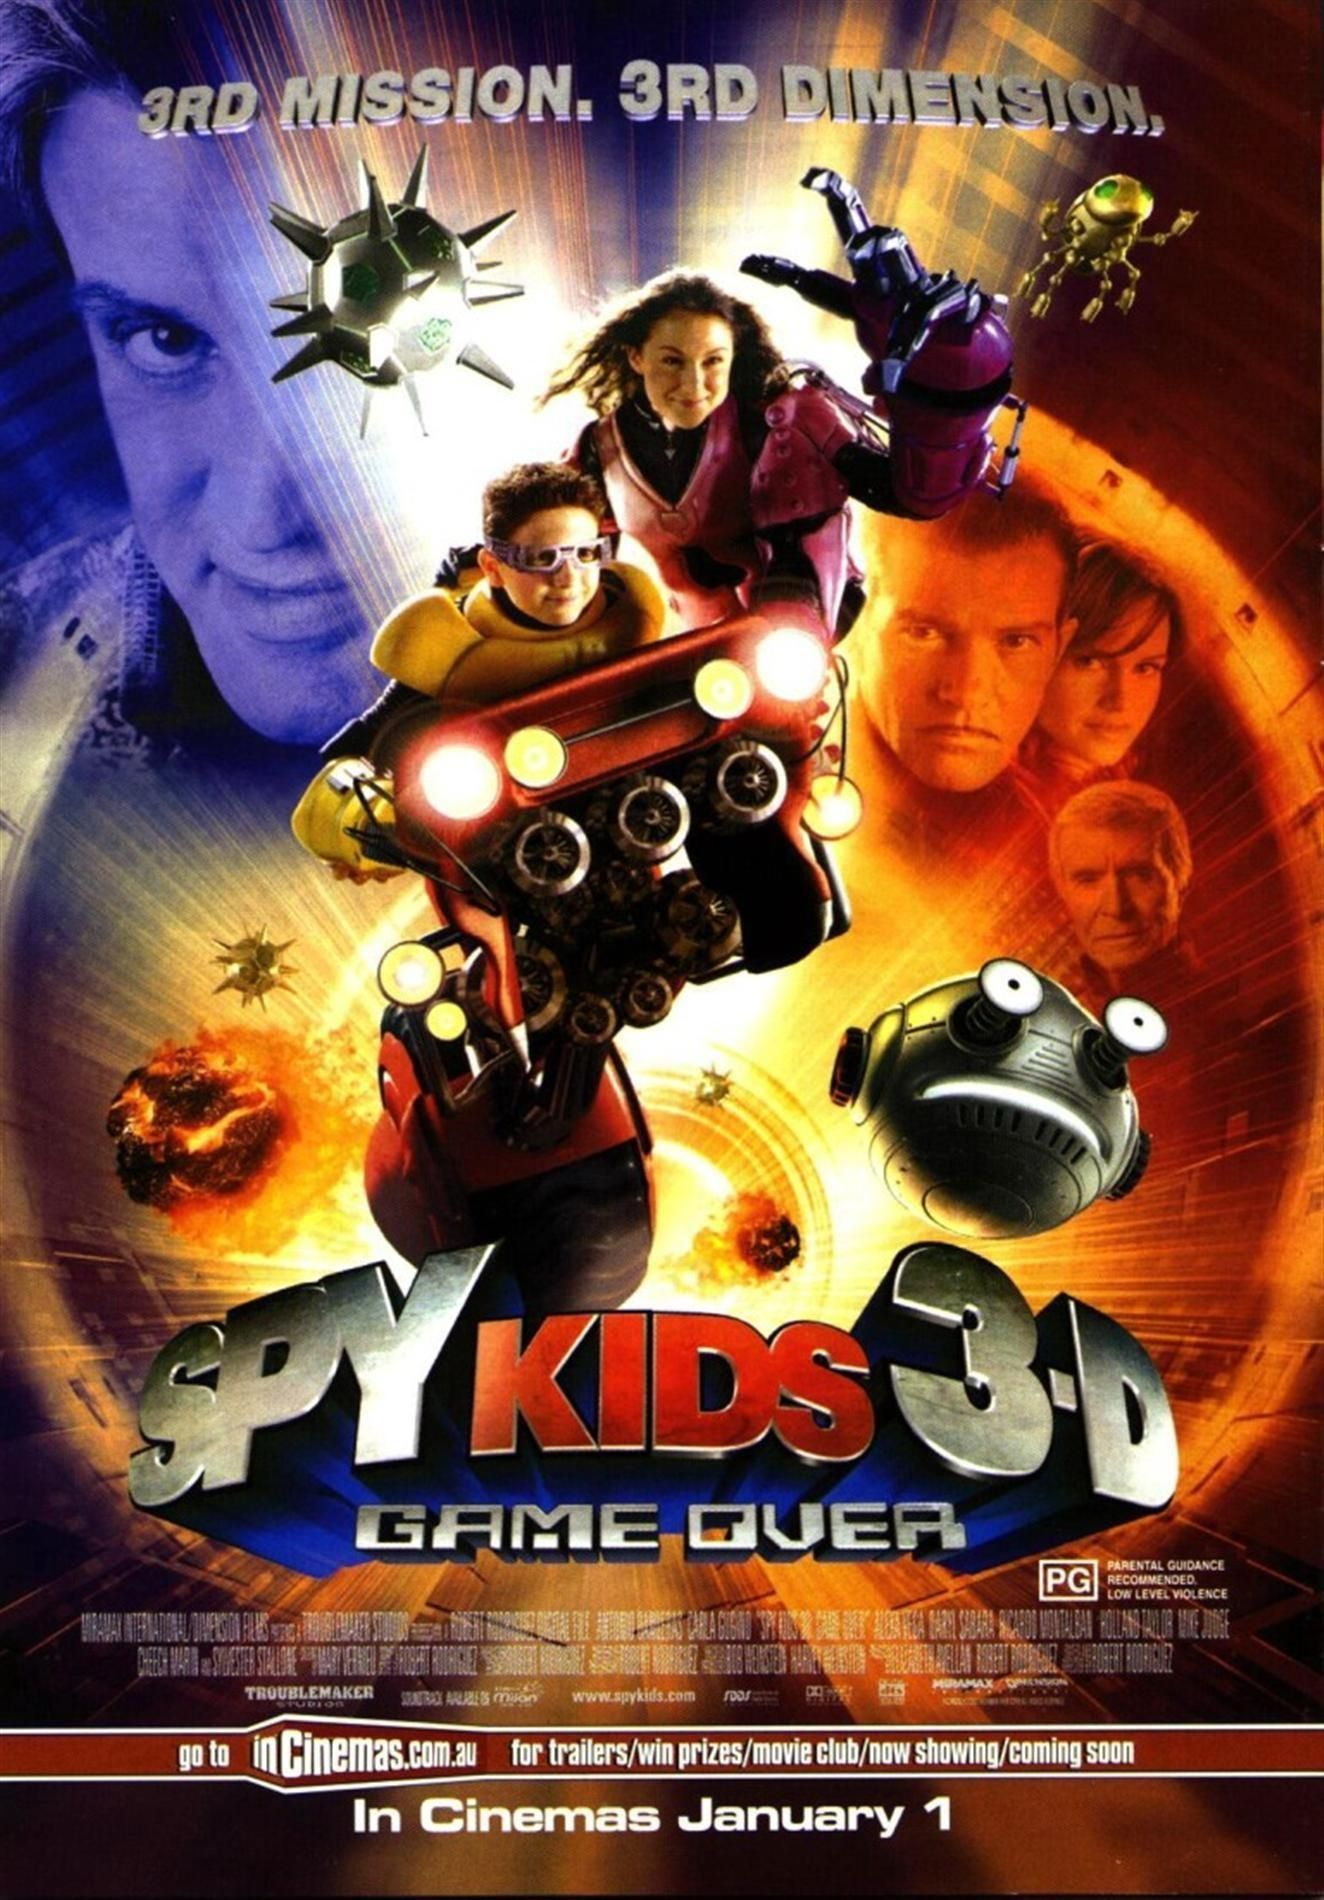 Kemkolykok 3d Game Over 2005 Spy Kids 3d Spy Kids 3d Game Over Spy Kids 3